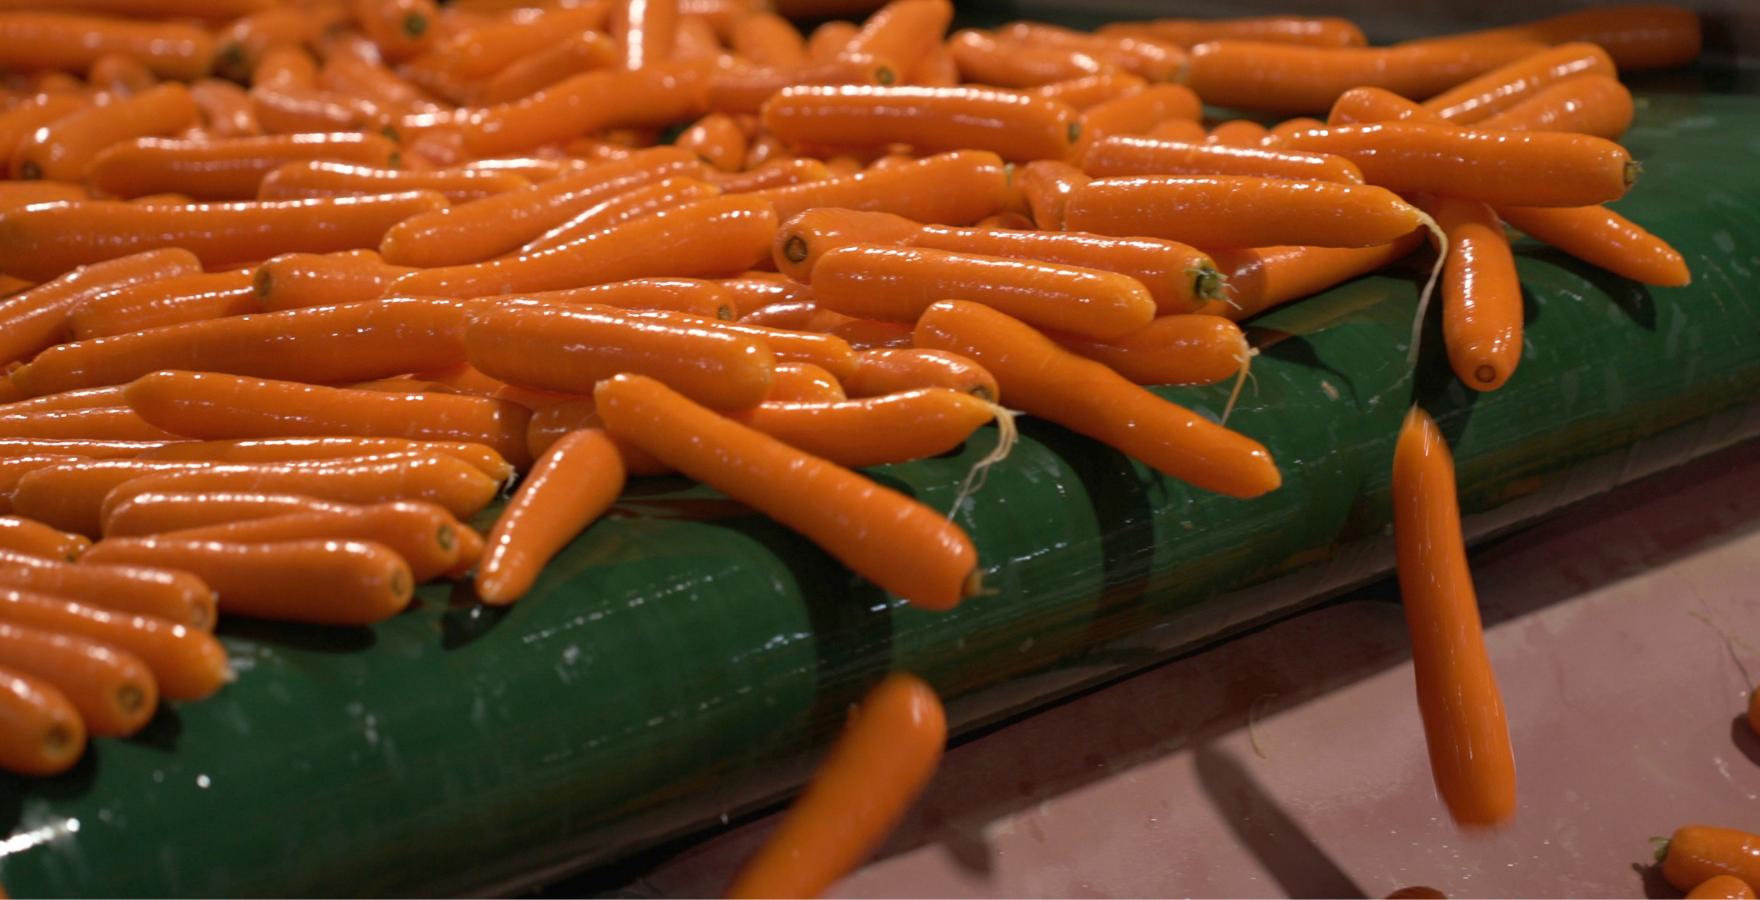 Carrots on conveyor belt